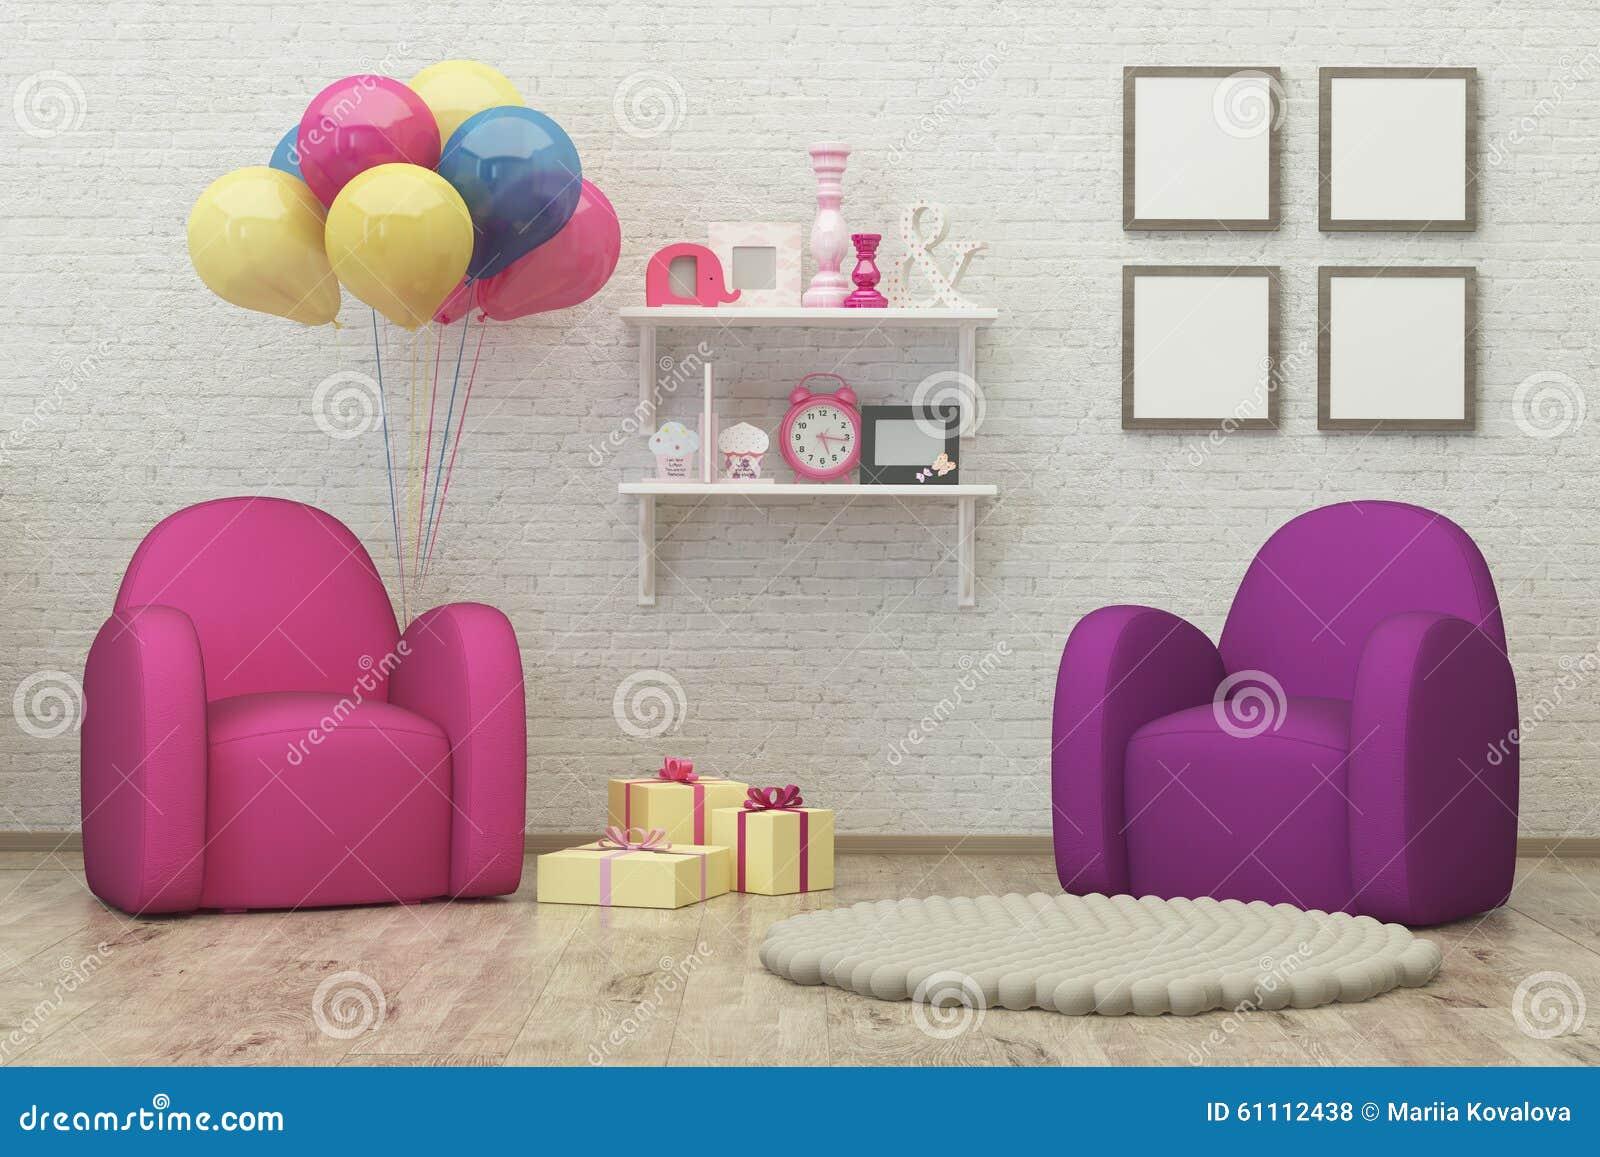 kids room interior 3d render image, pouf,balloons stock